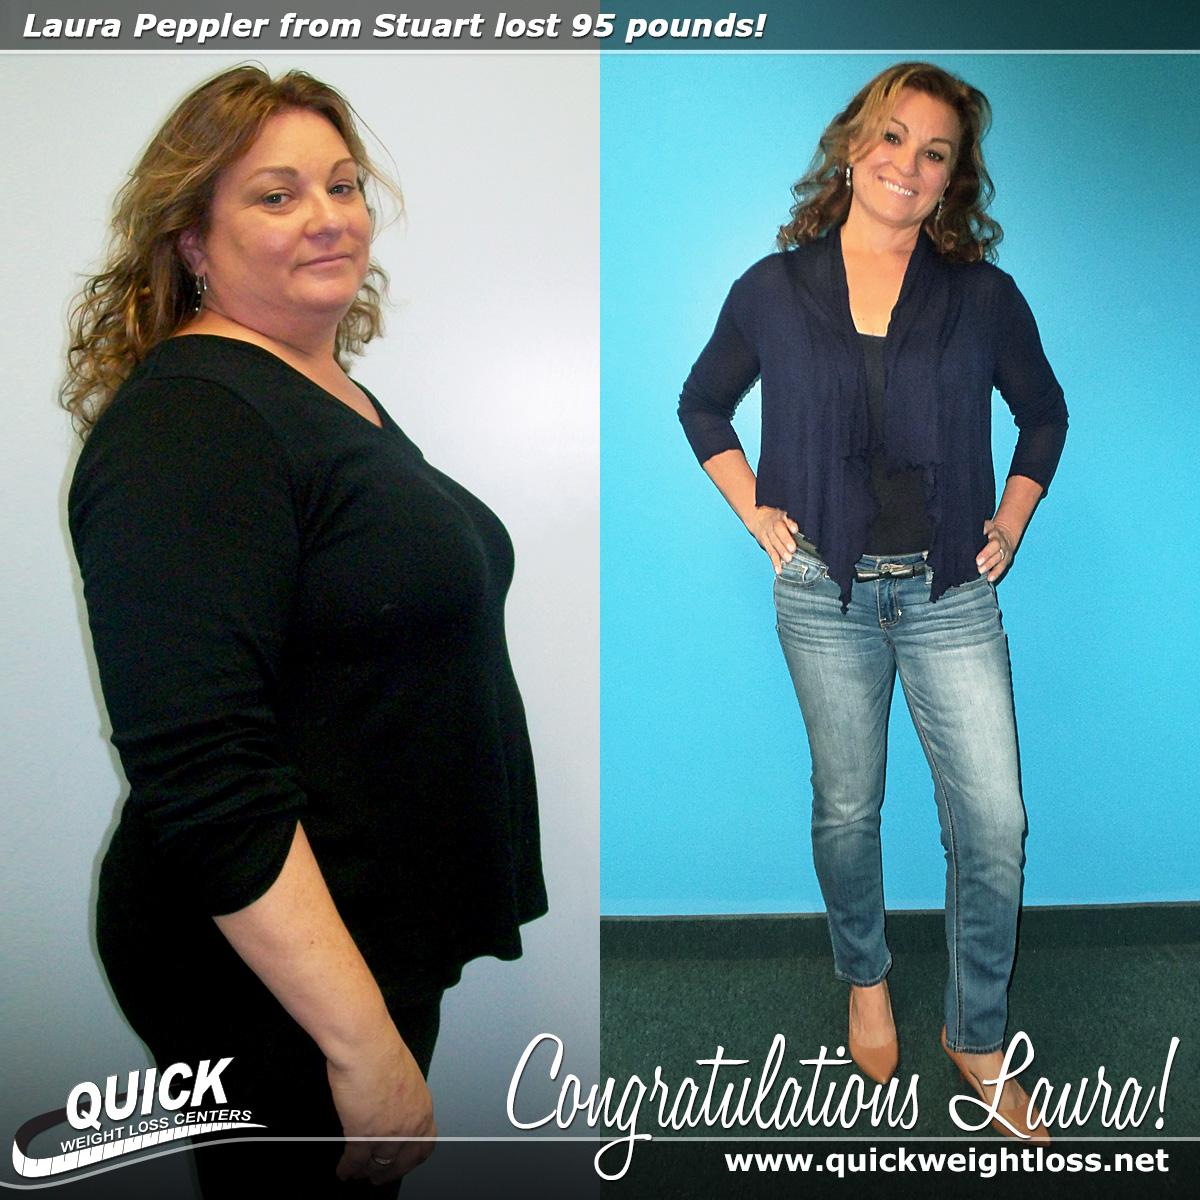 1 week detox diet plan weight loss image 3